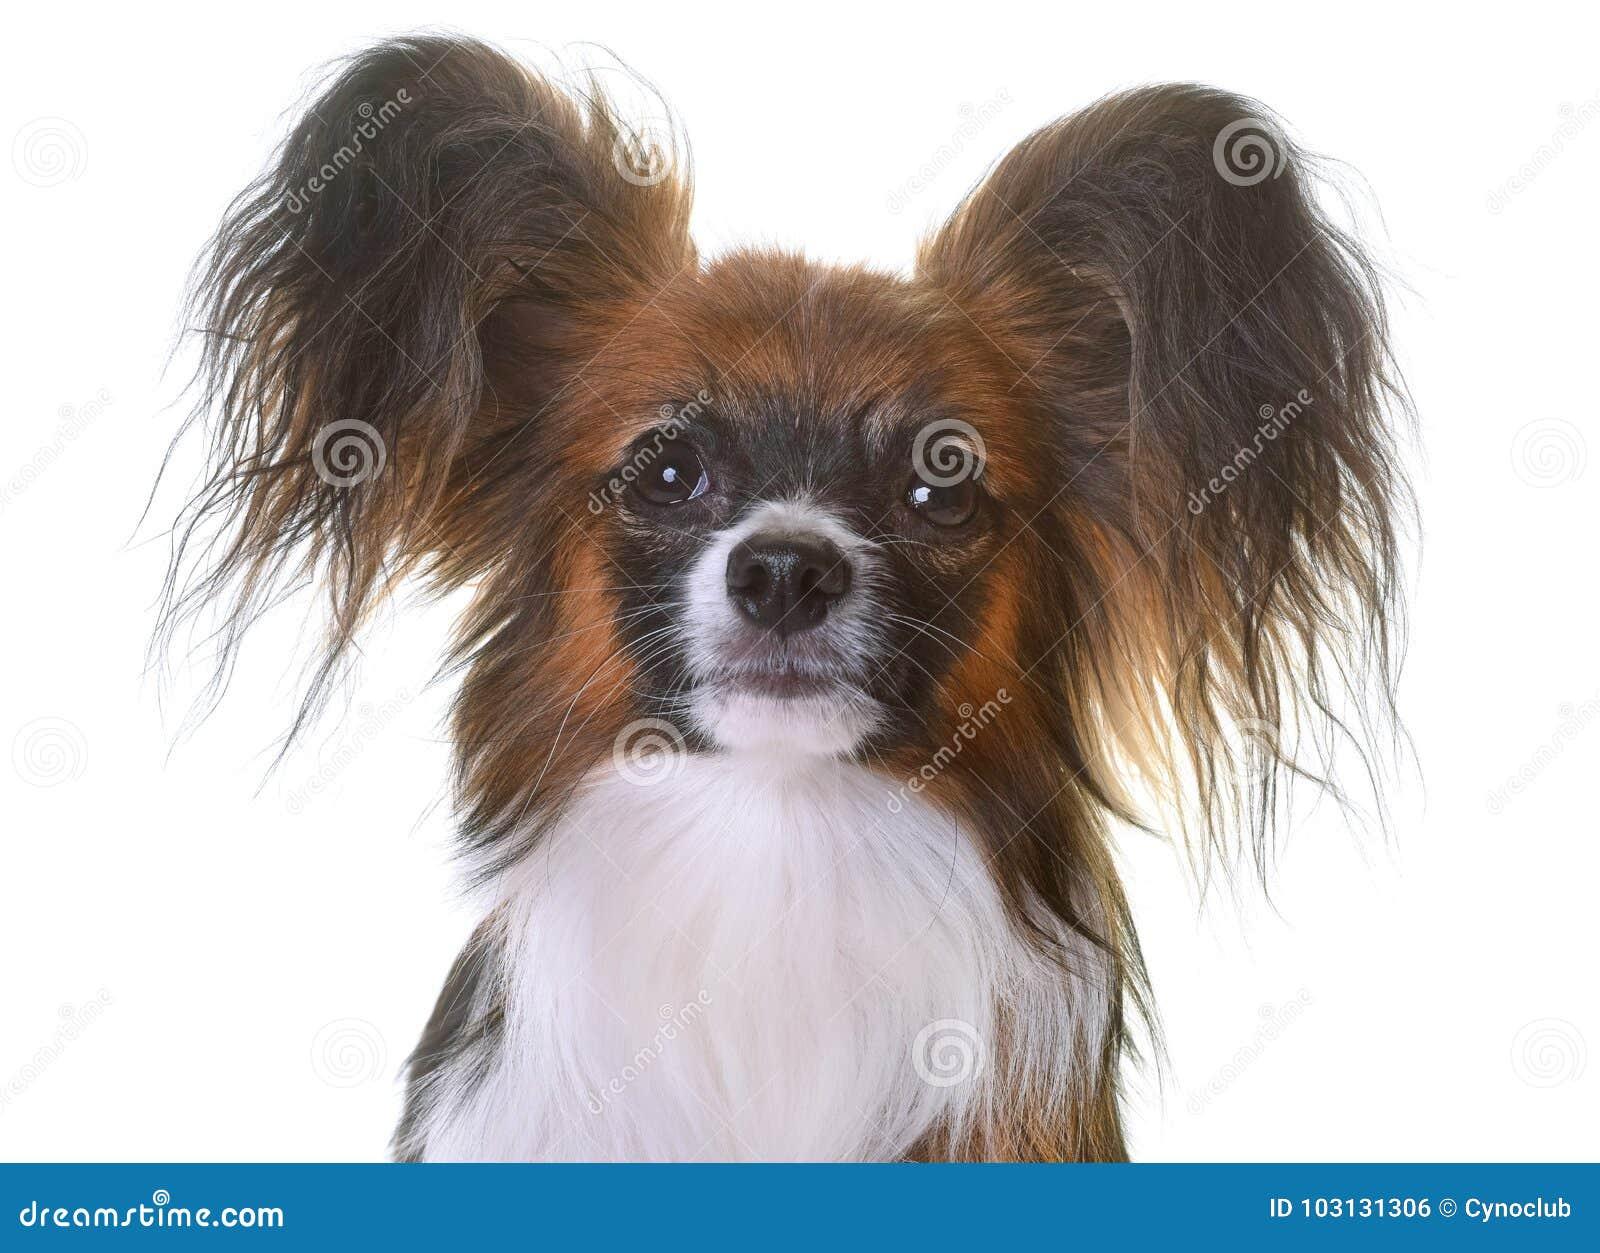 Young papillon dog